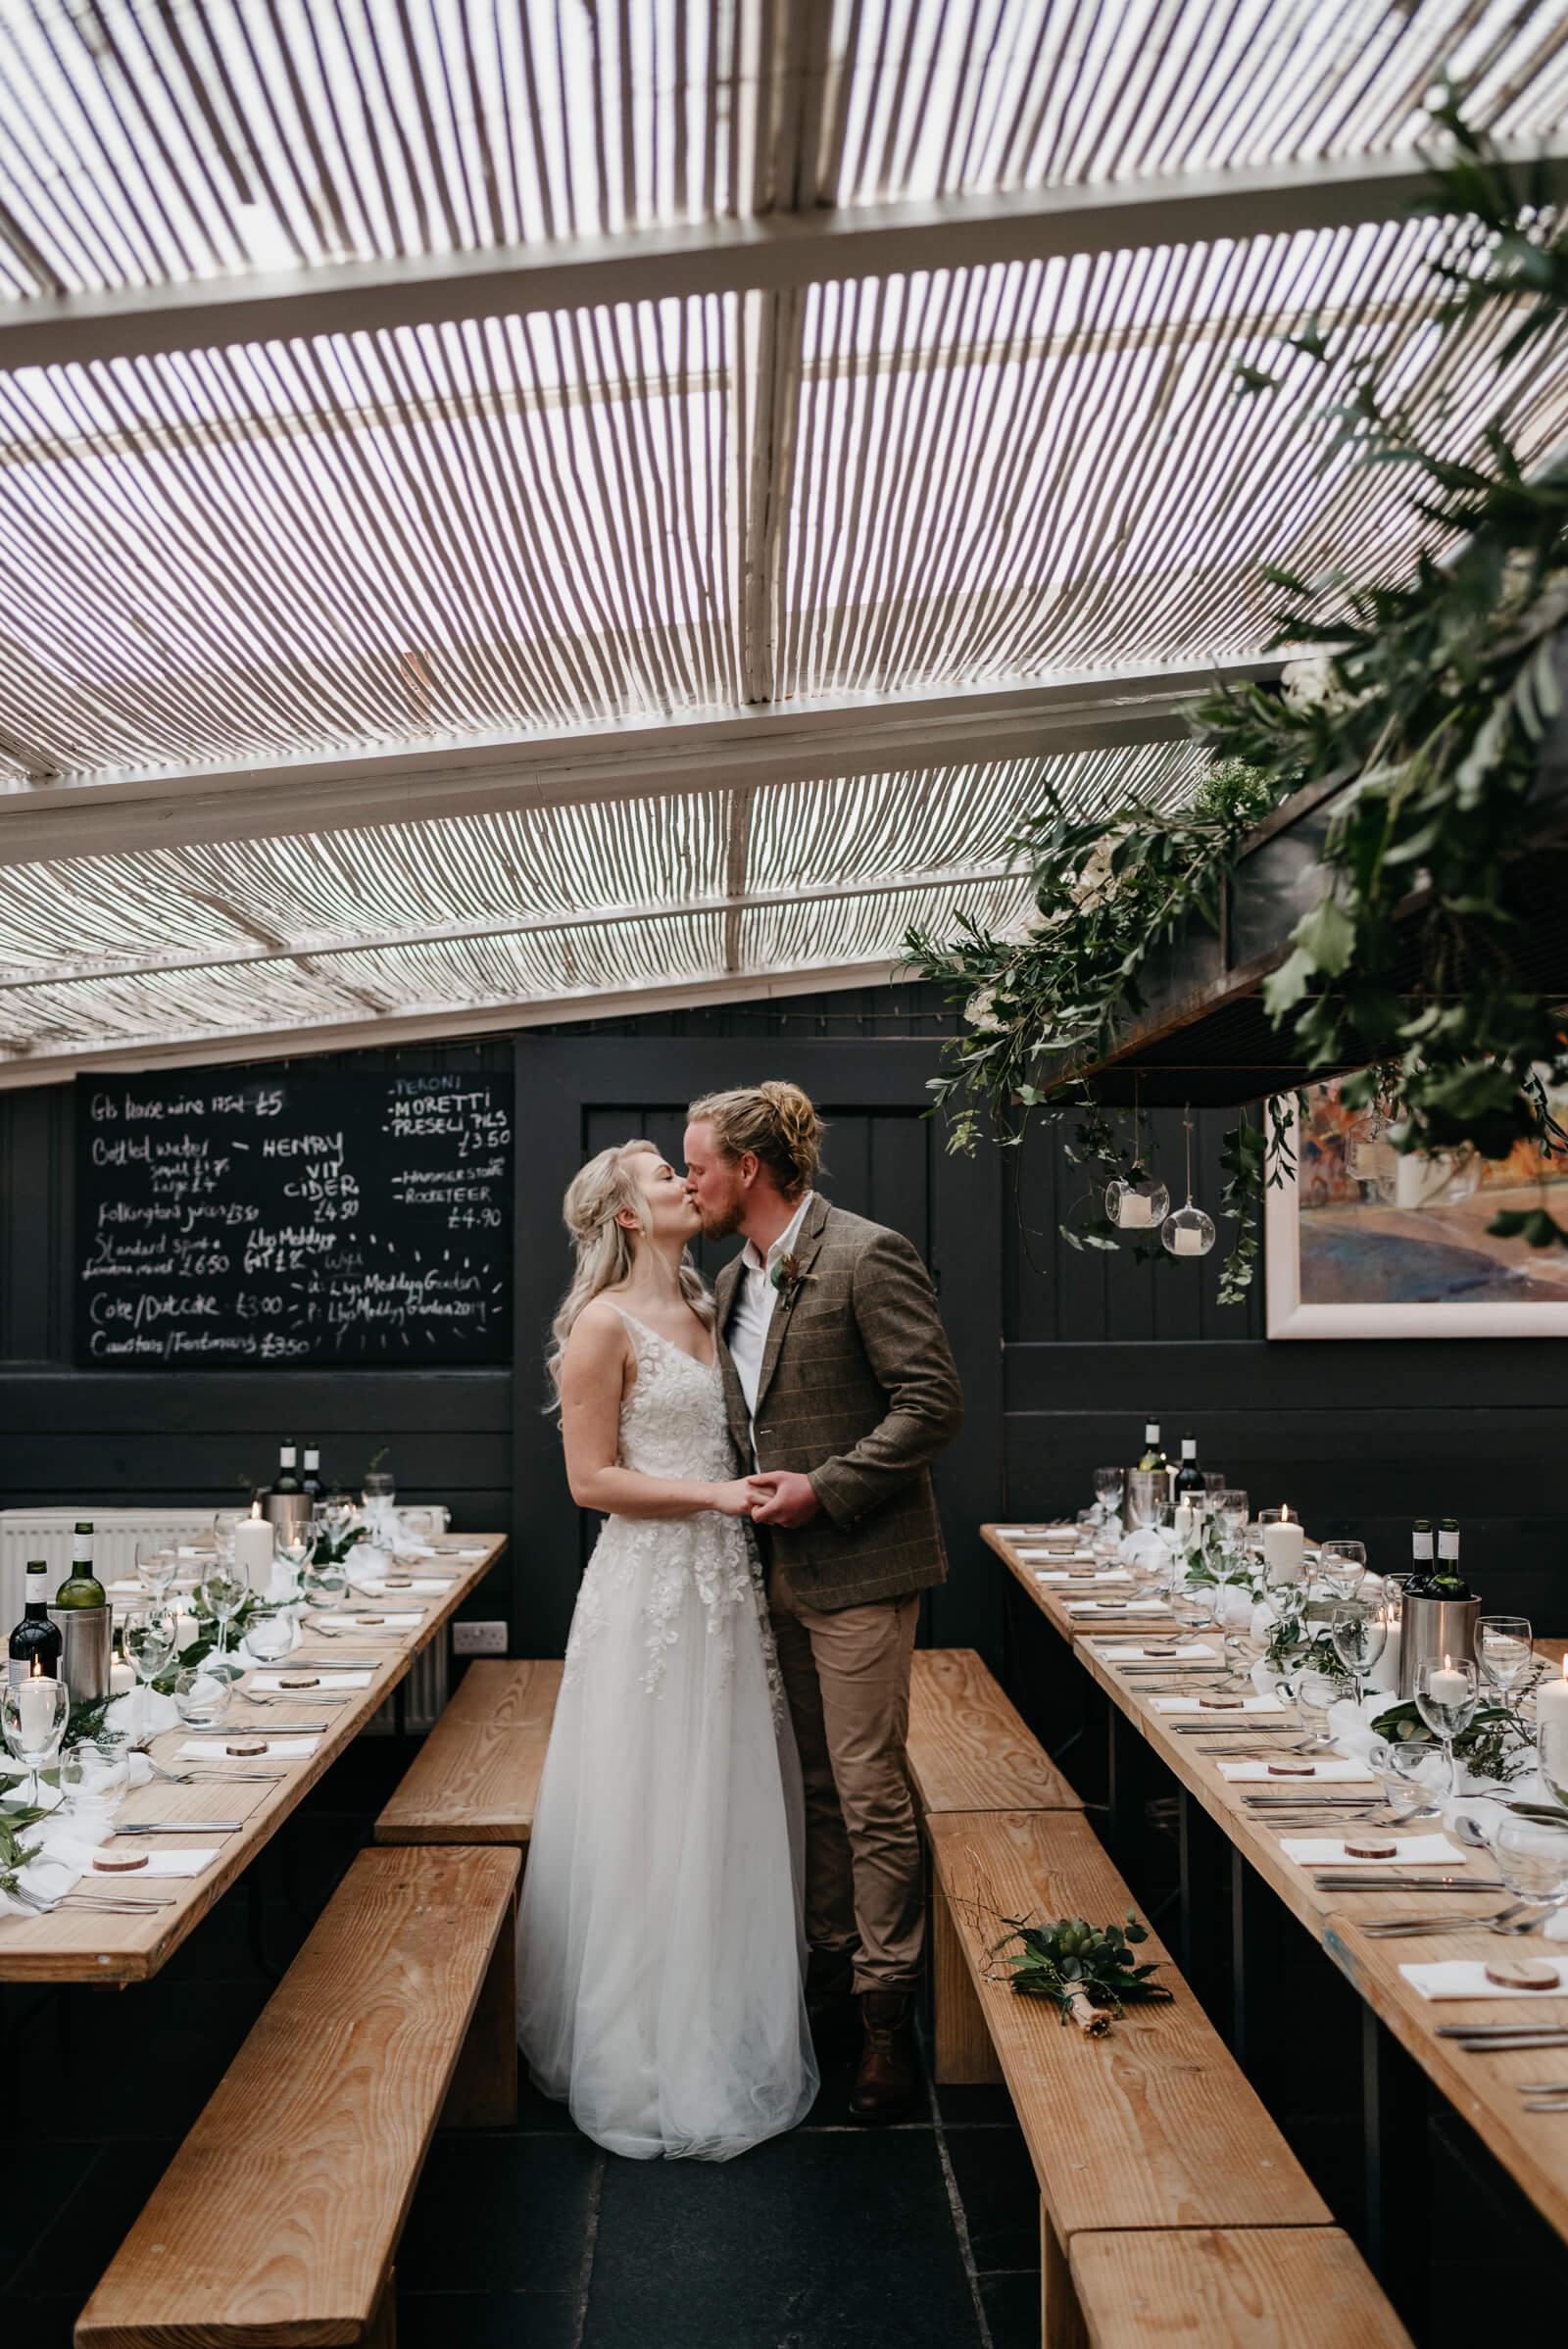 Bride and Groom kiss in Pembrokeshire wedding venue Llys Meddyg